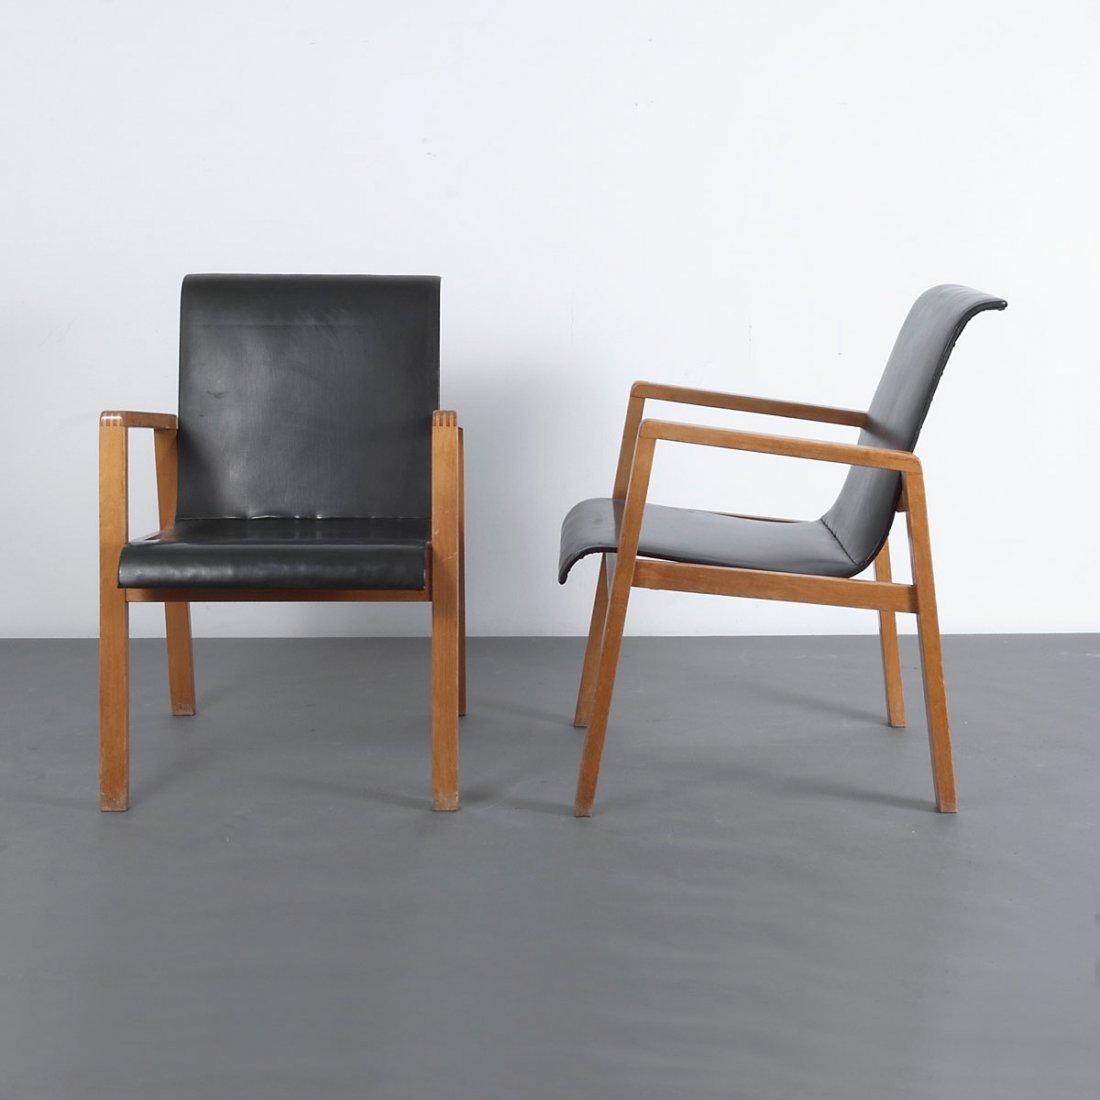 Alvar Aalto. Pair of '403' chairs, 1930-32. H. 76.5 x 5